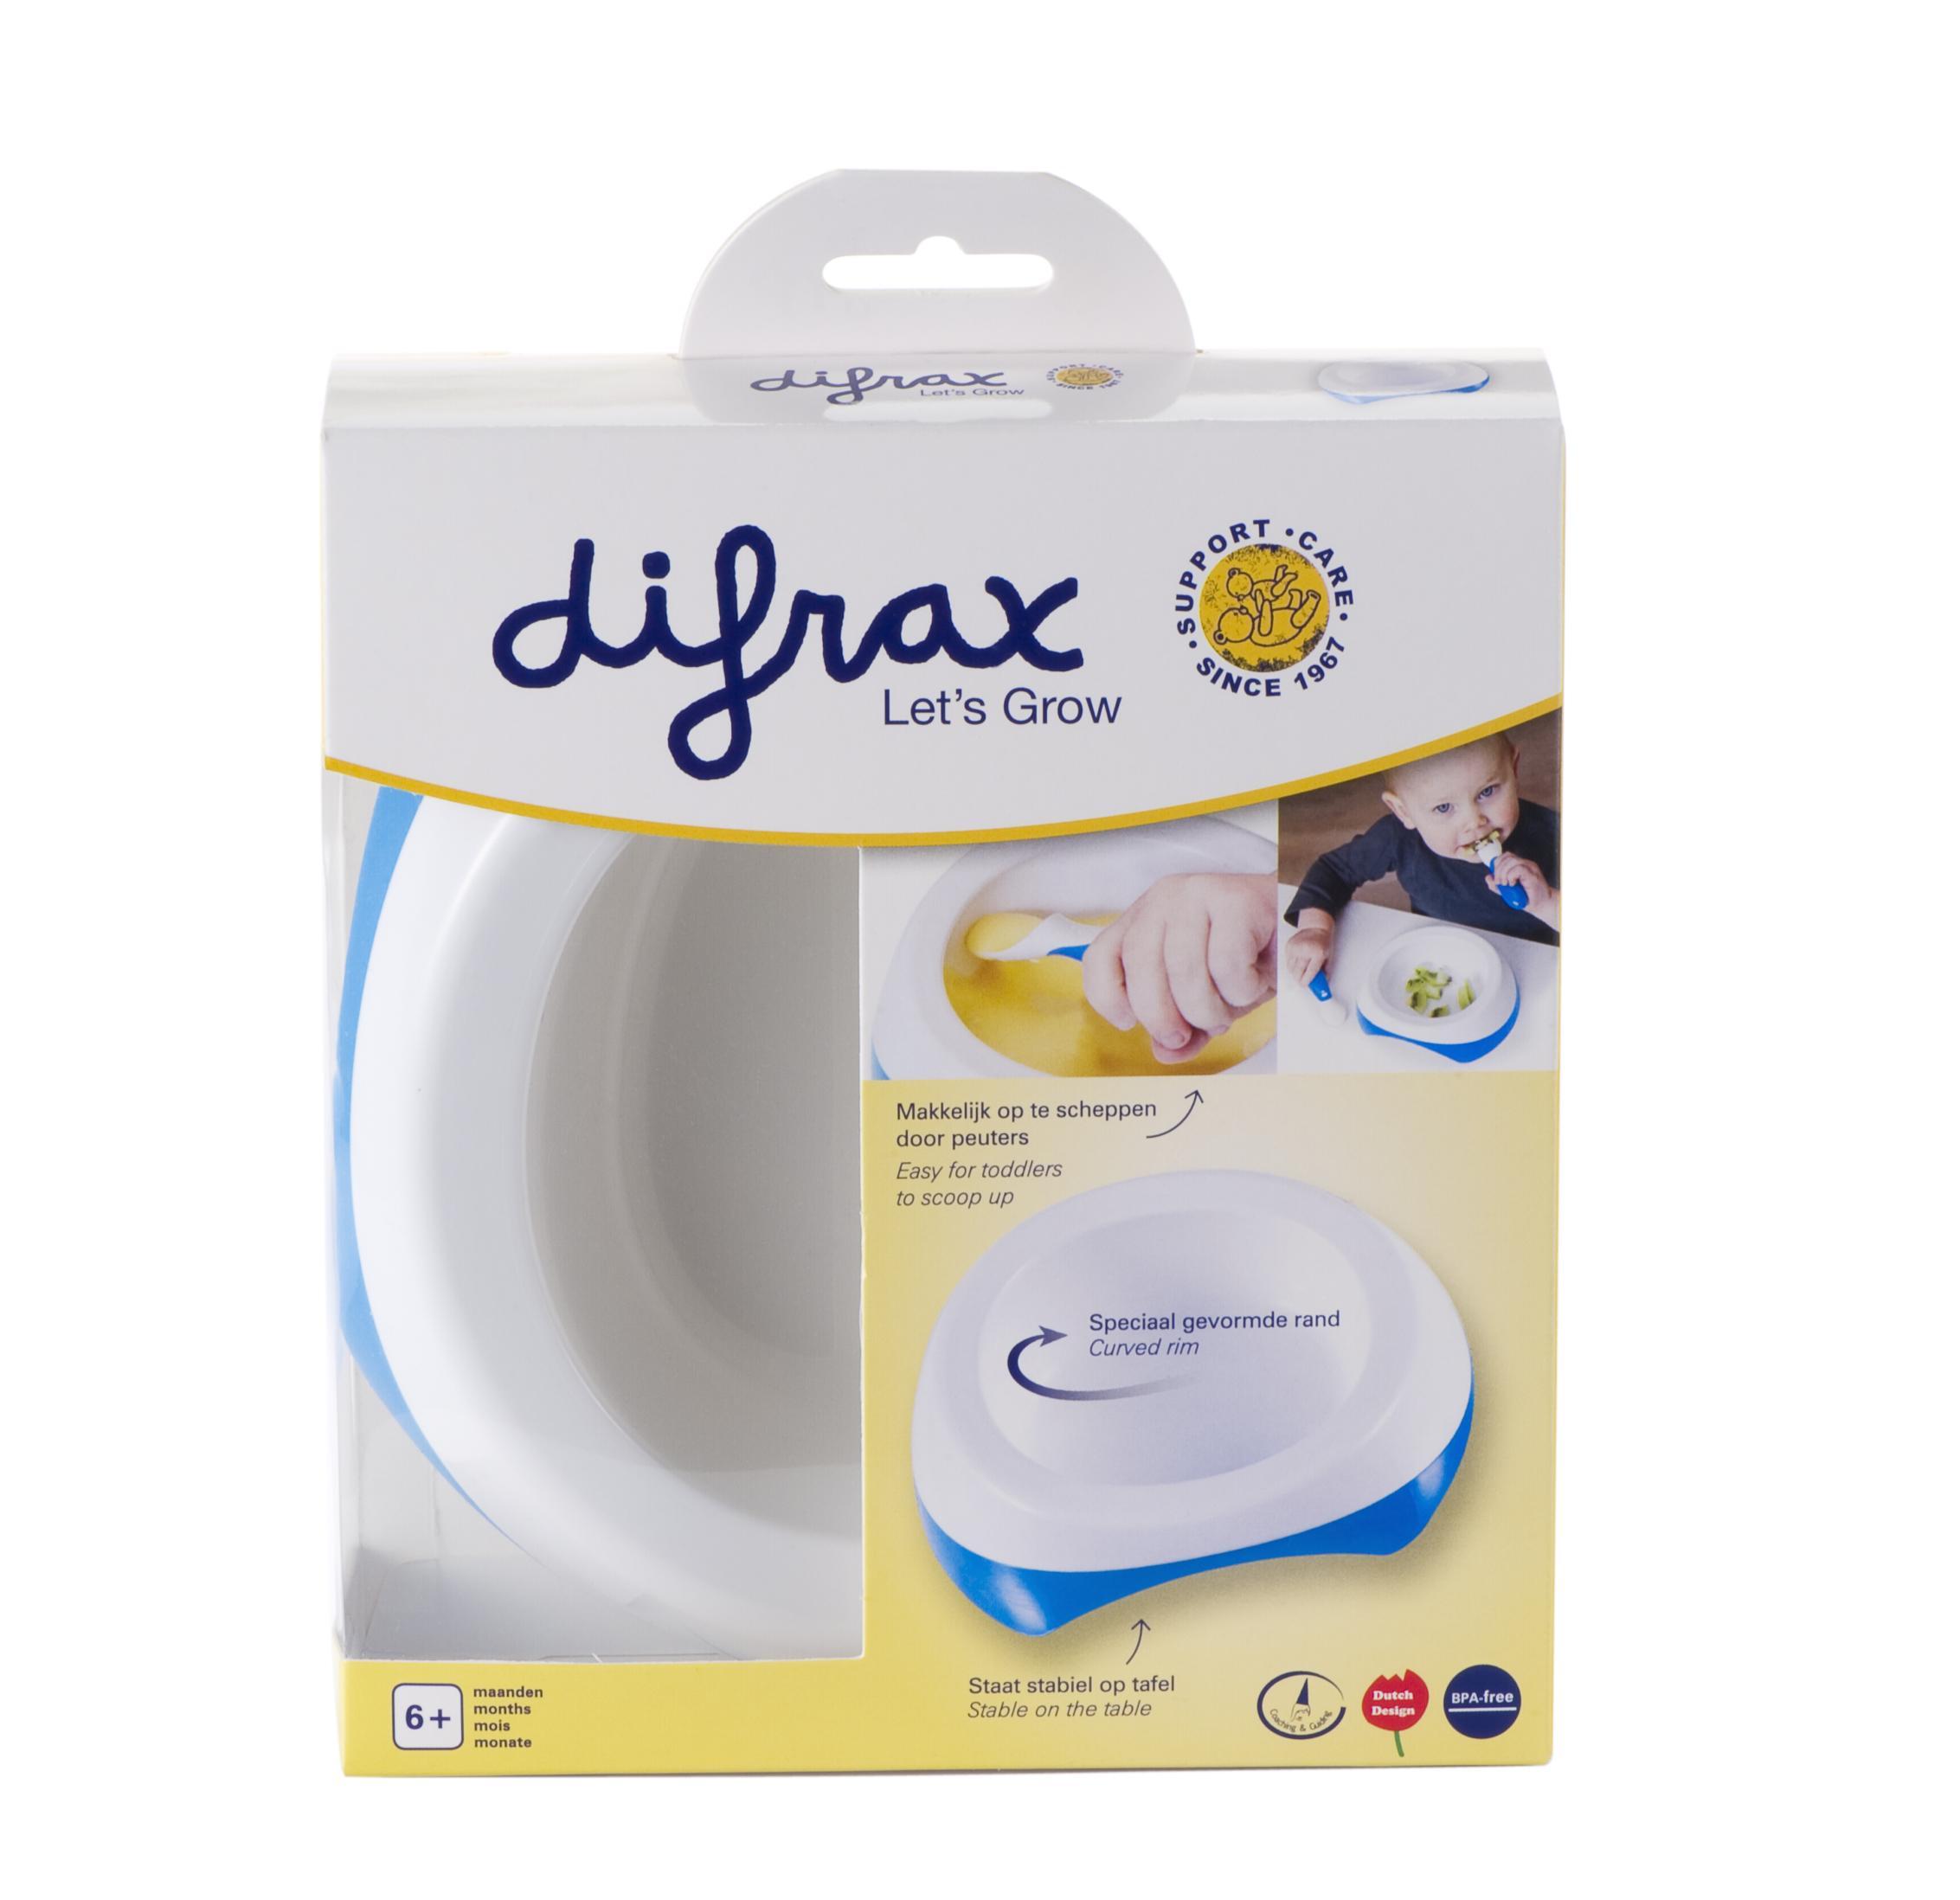 DIFRAX dubenėliai mokymuisi valgyti - Difrax